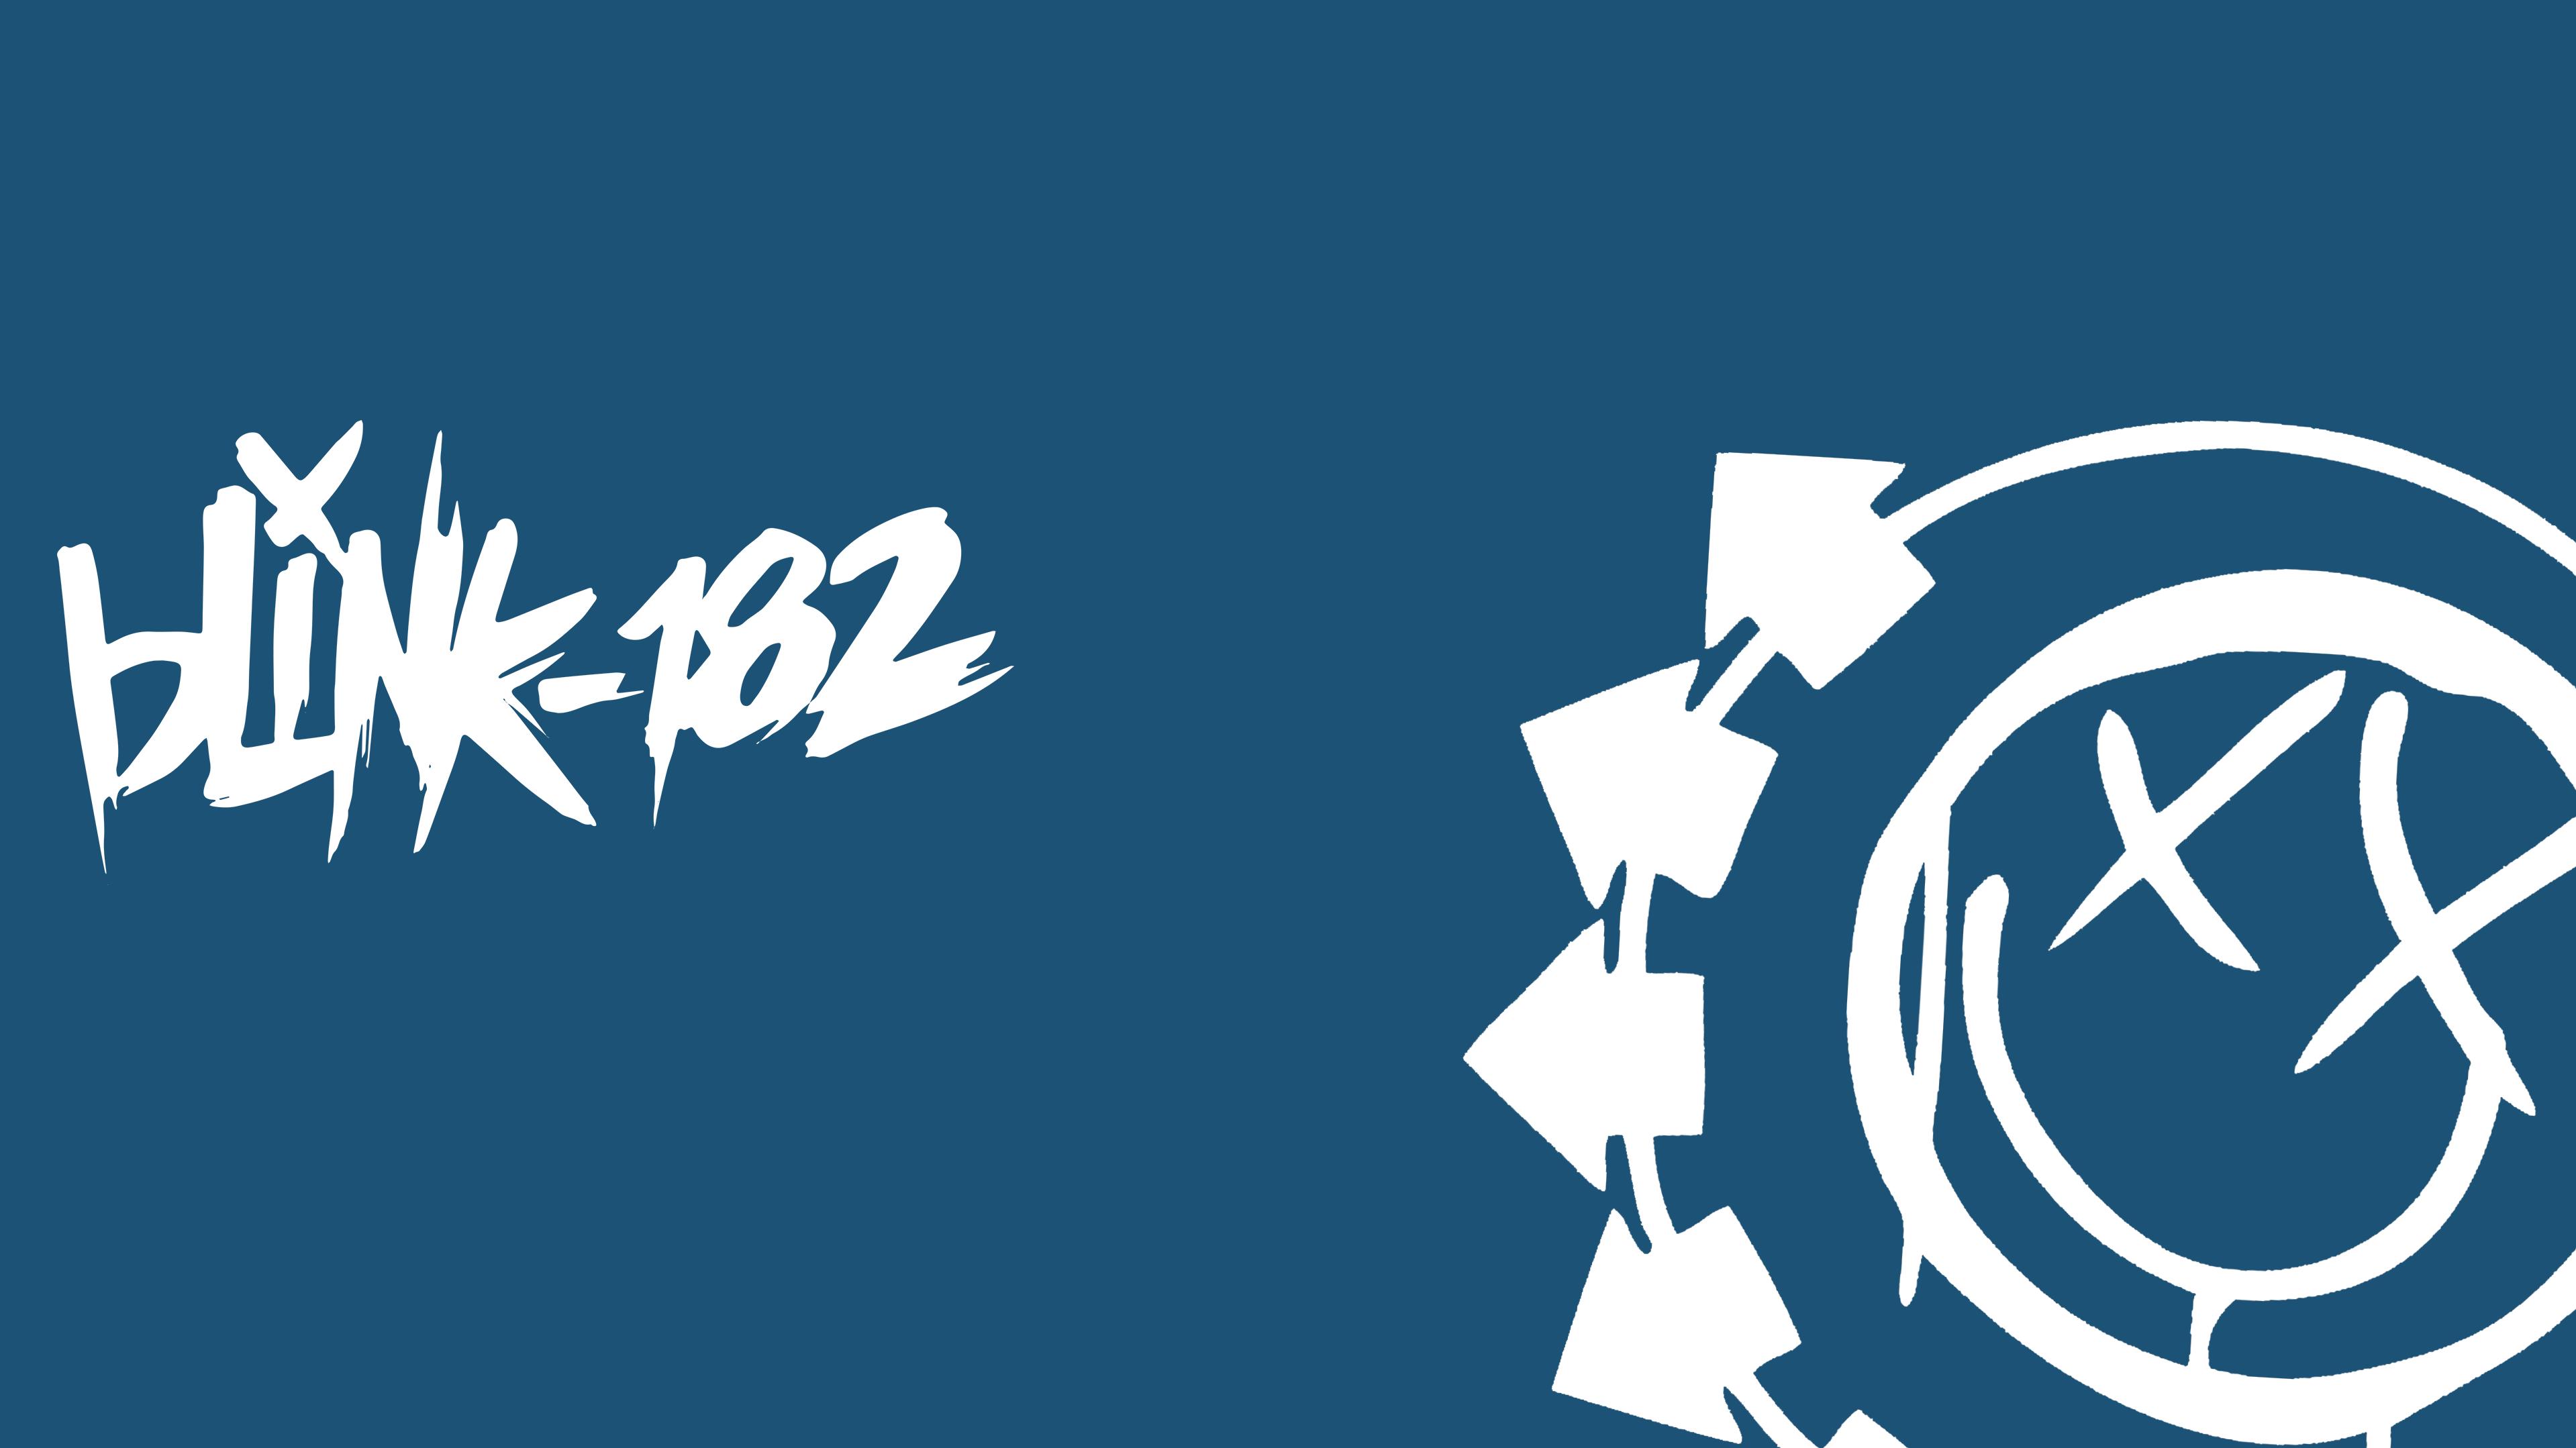 Blink 182 Wallpapers   Top Blink 182 Backgrounds 3838x2158